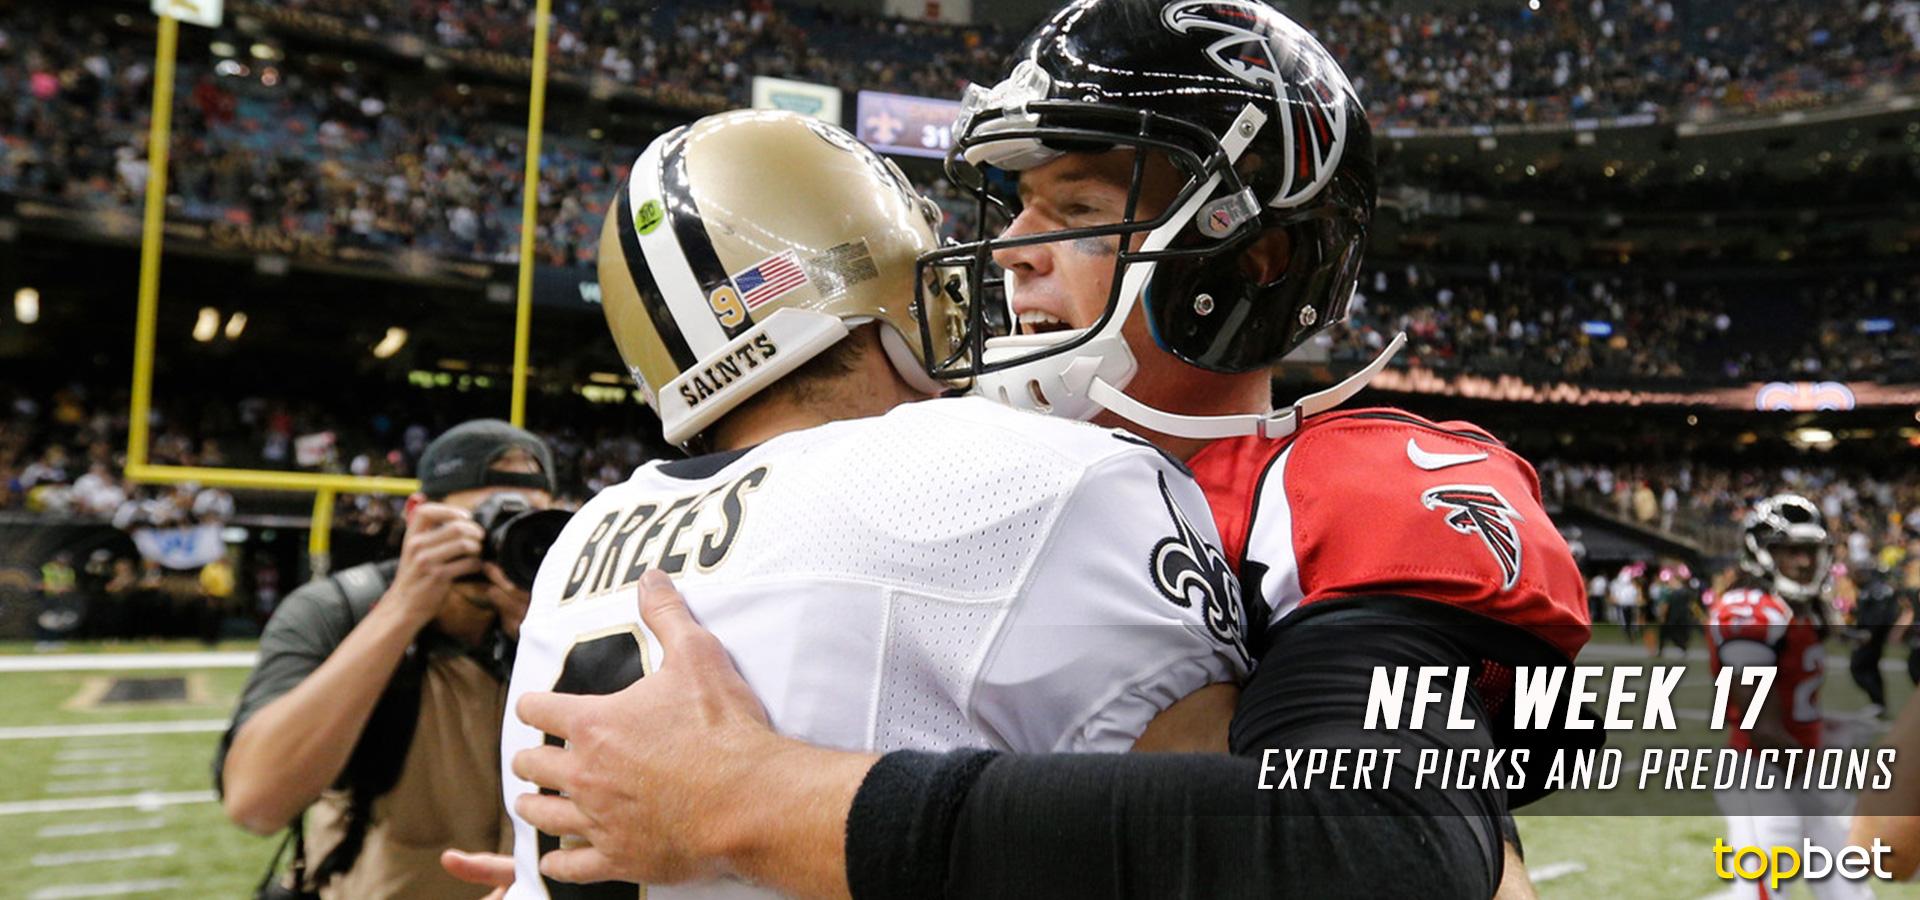 2016 NFL Week 17 Expert Picks and Predictions